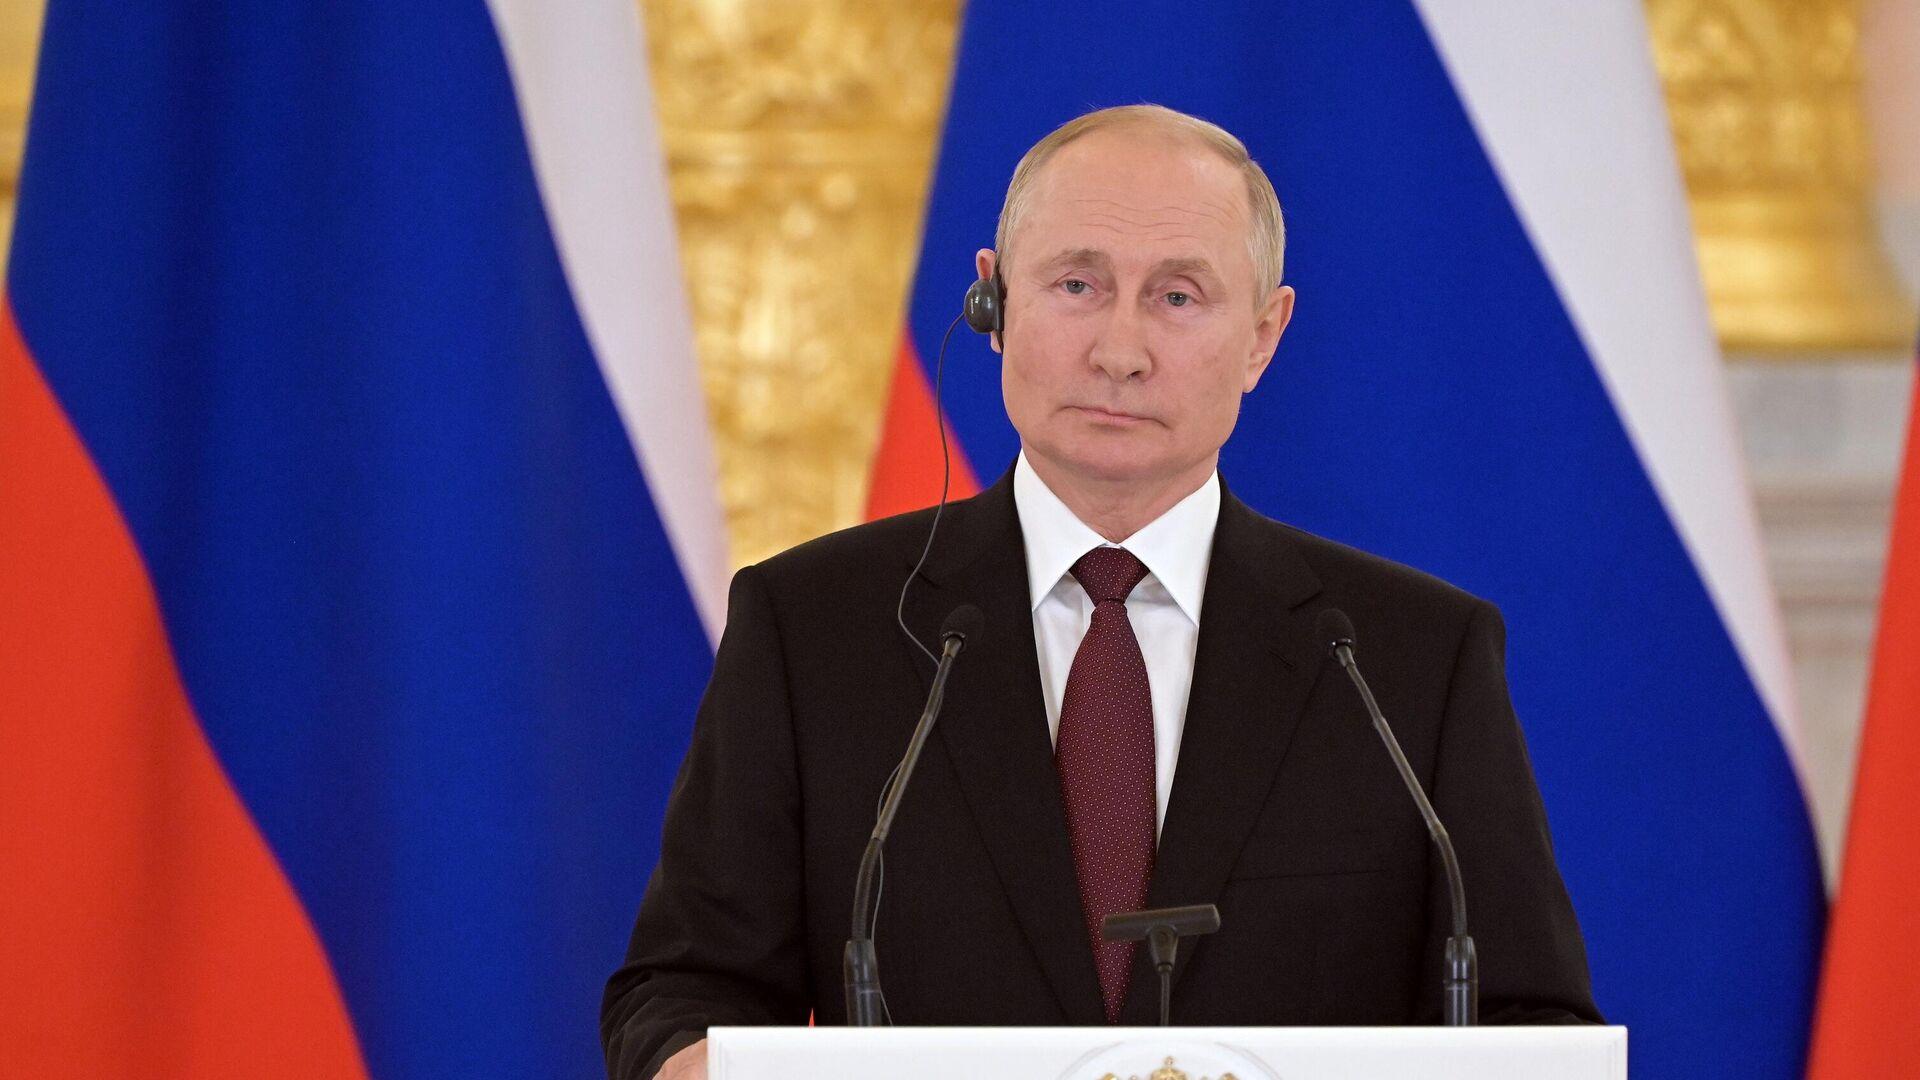 Vladímir Putin, presidente de Rusia - Sputnik Mundo, 1920, 20.08.2021